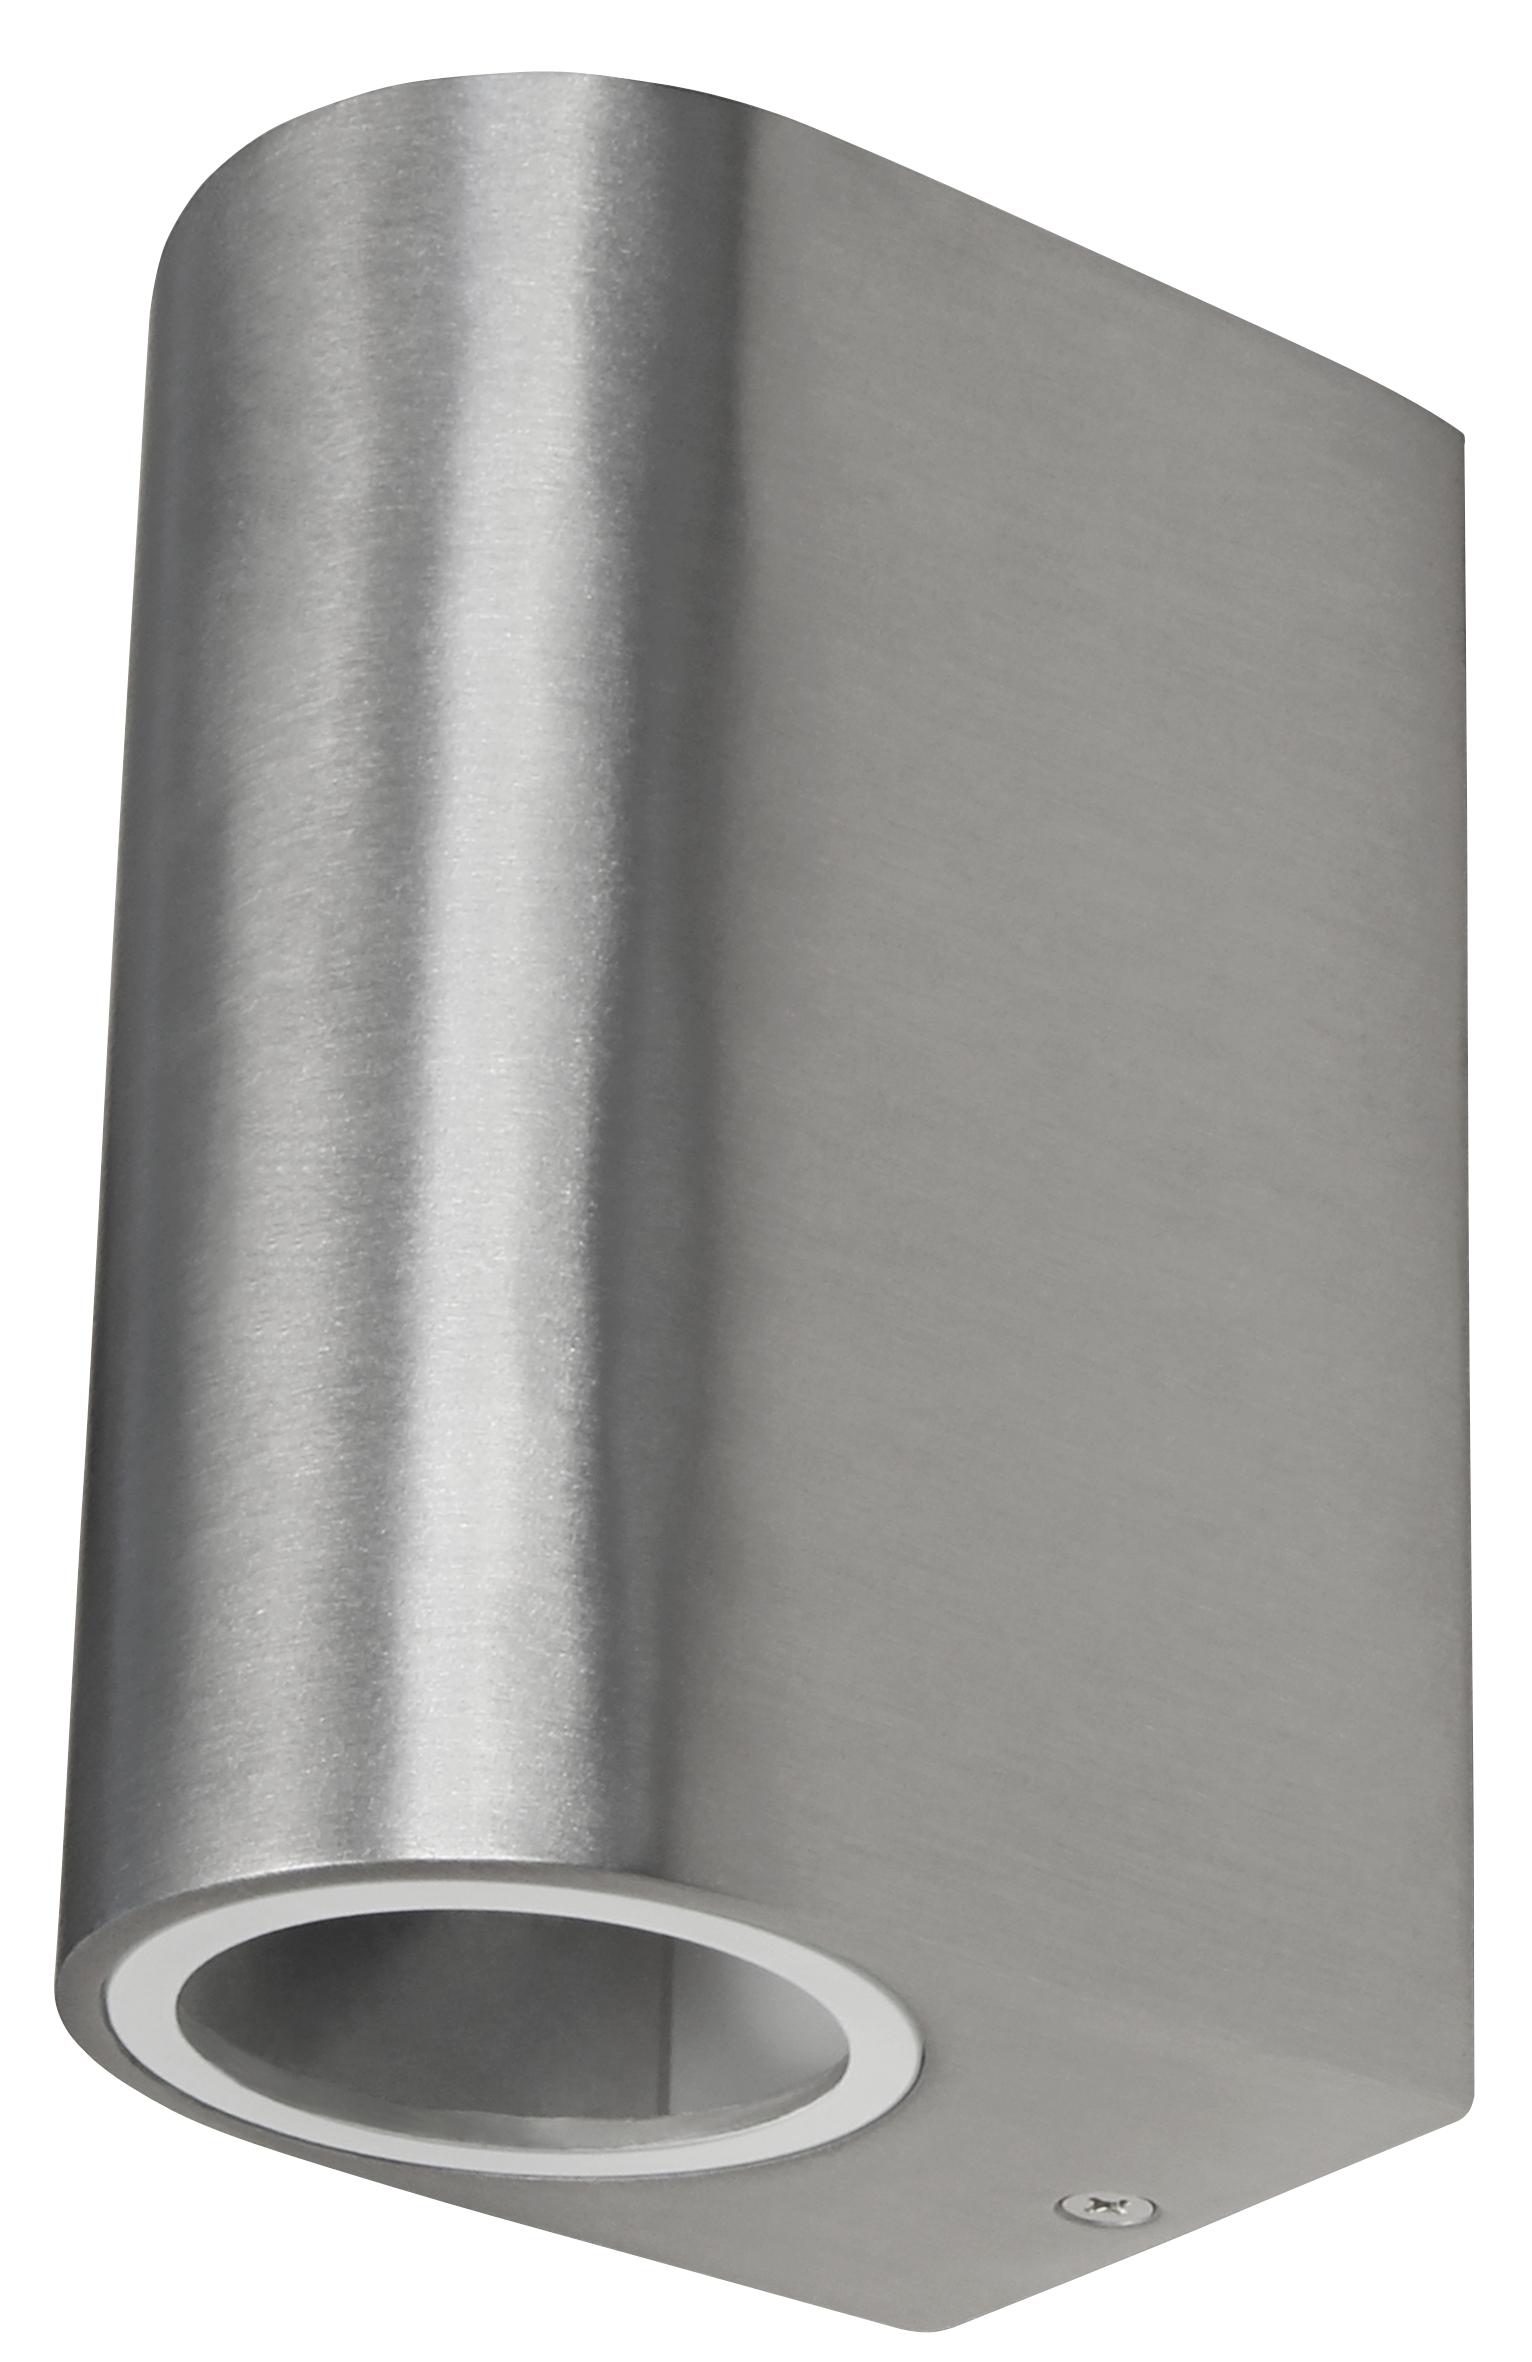 Wandleuchte McShine ''Oval-E'' Edelstahl-Optik, IP44, 2x GU10, Aluminium Gehäuse